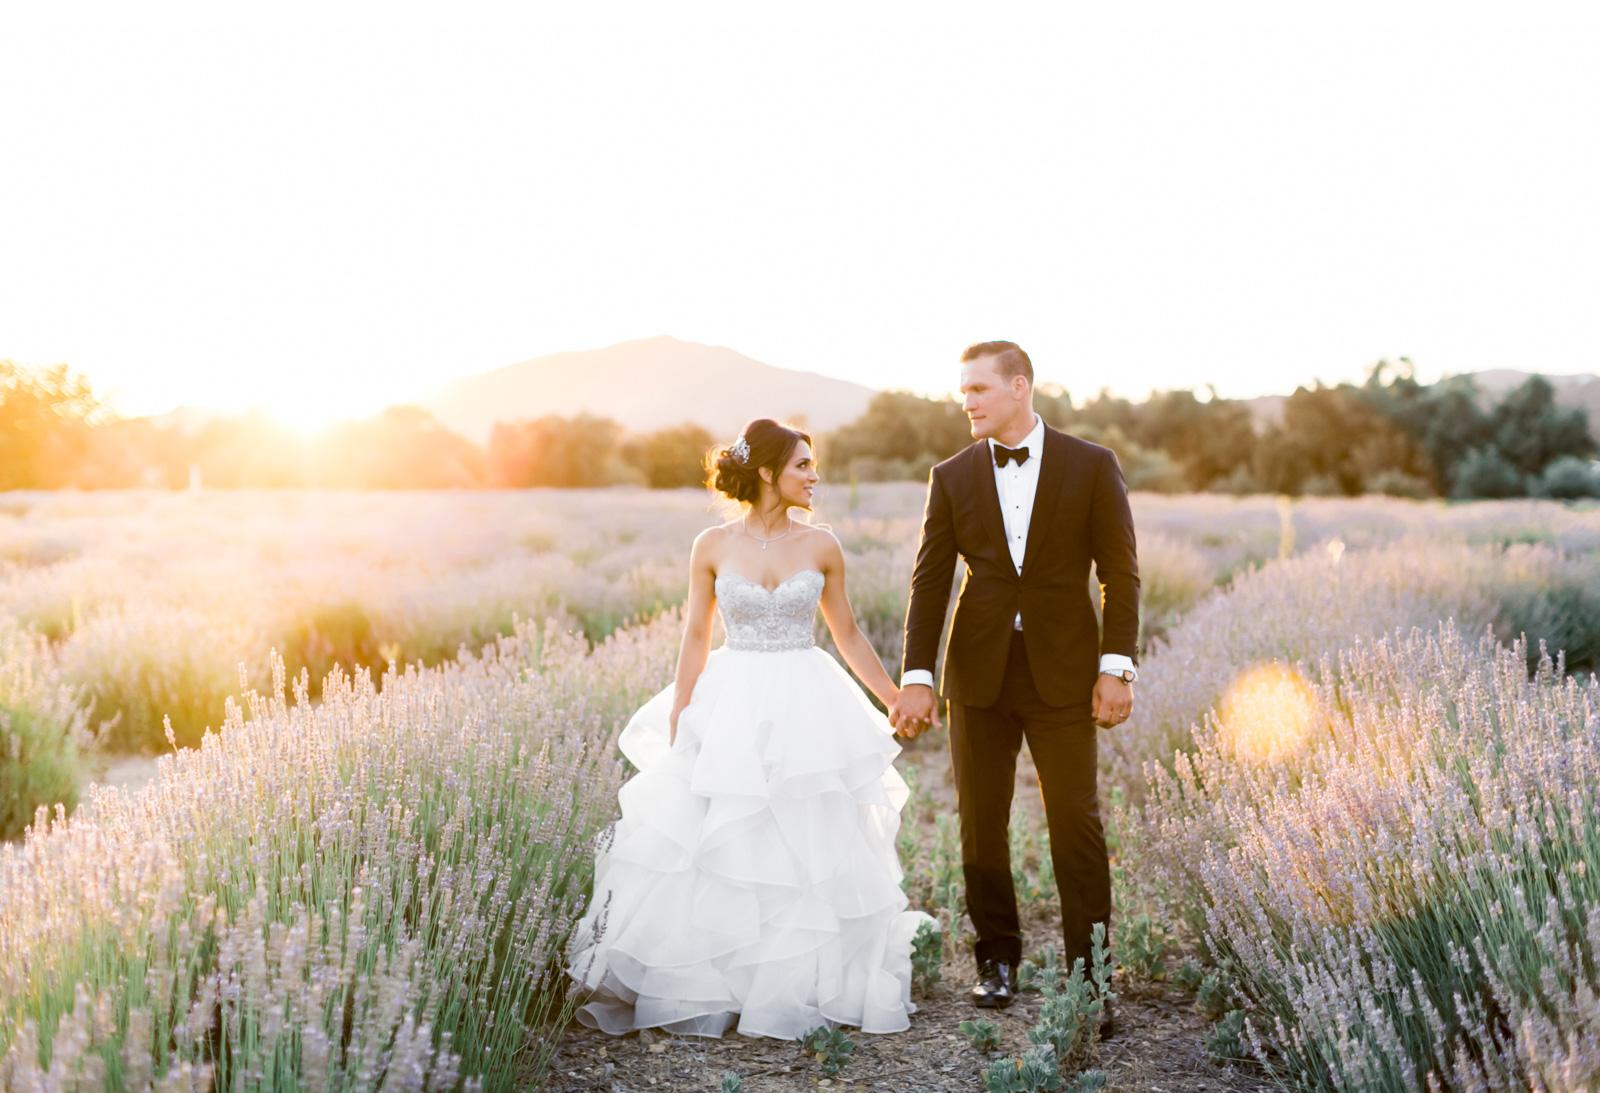 Lavender-field-style-me-pretty-wedding-natalie-schutt-photography_03.jpg